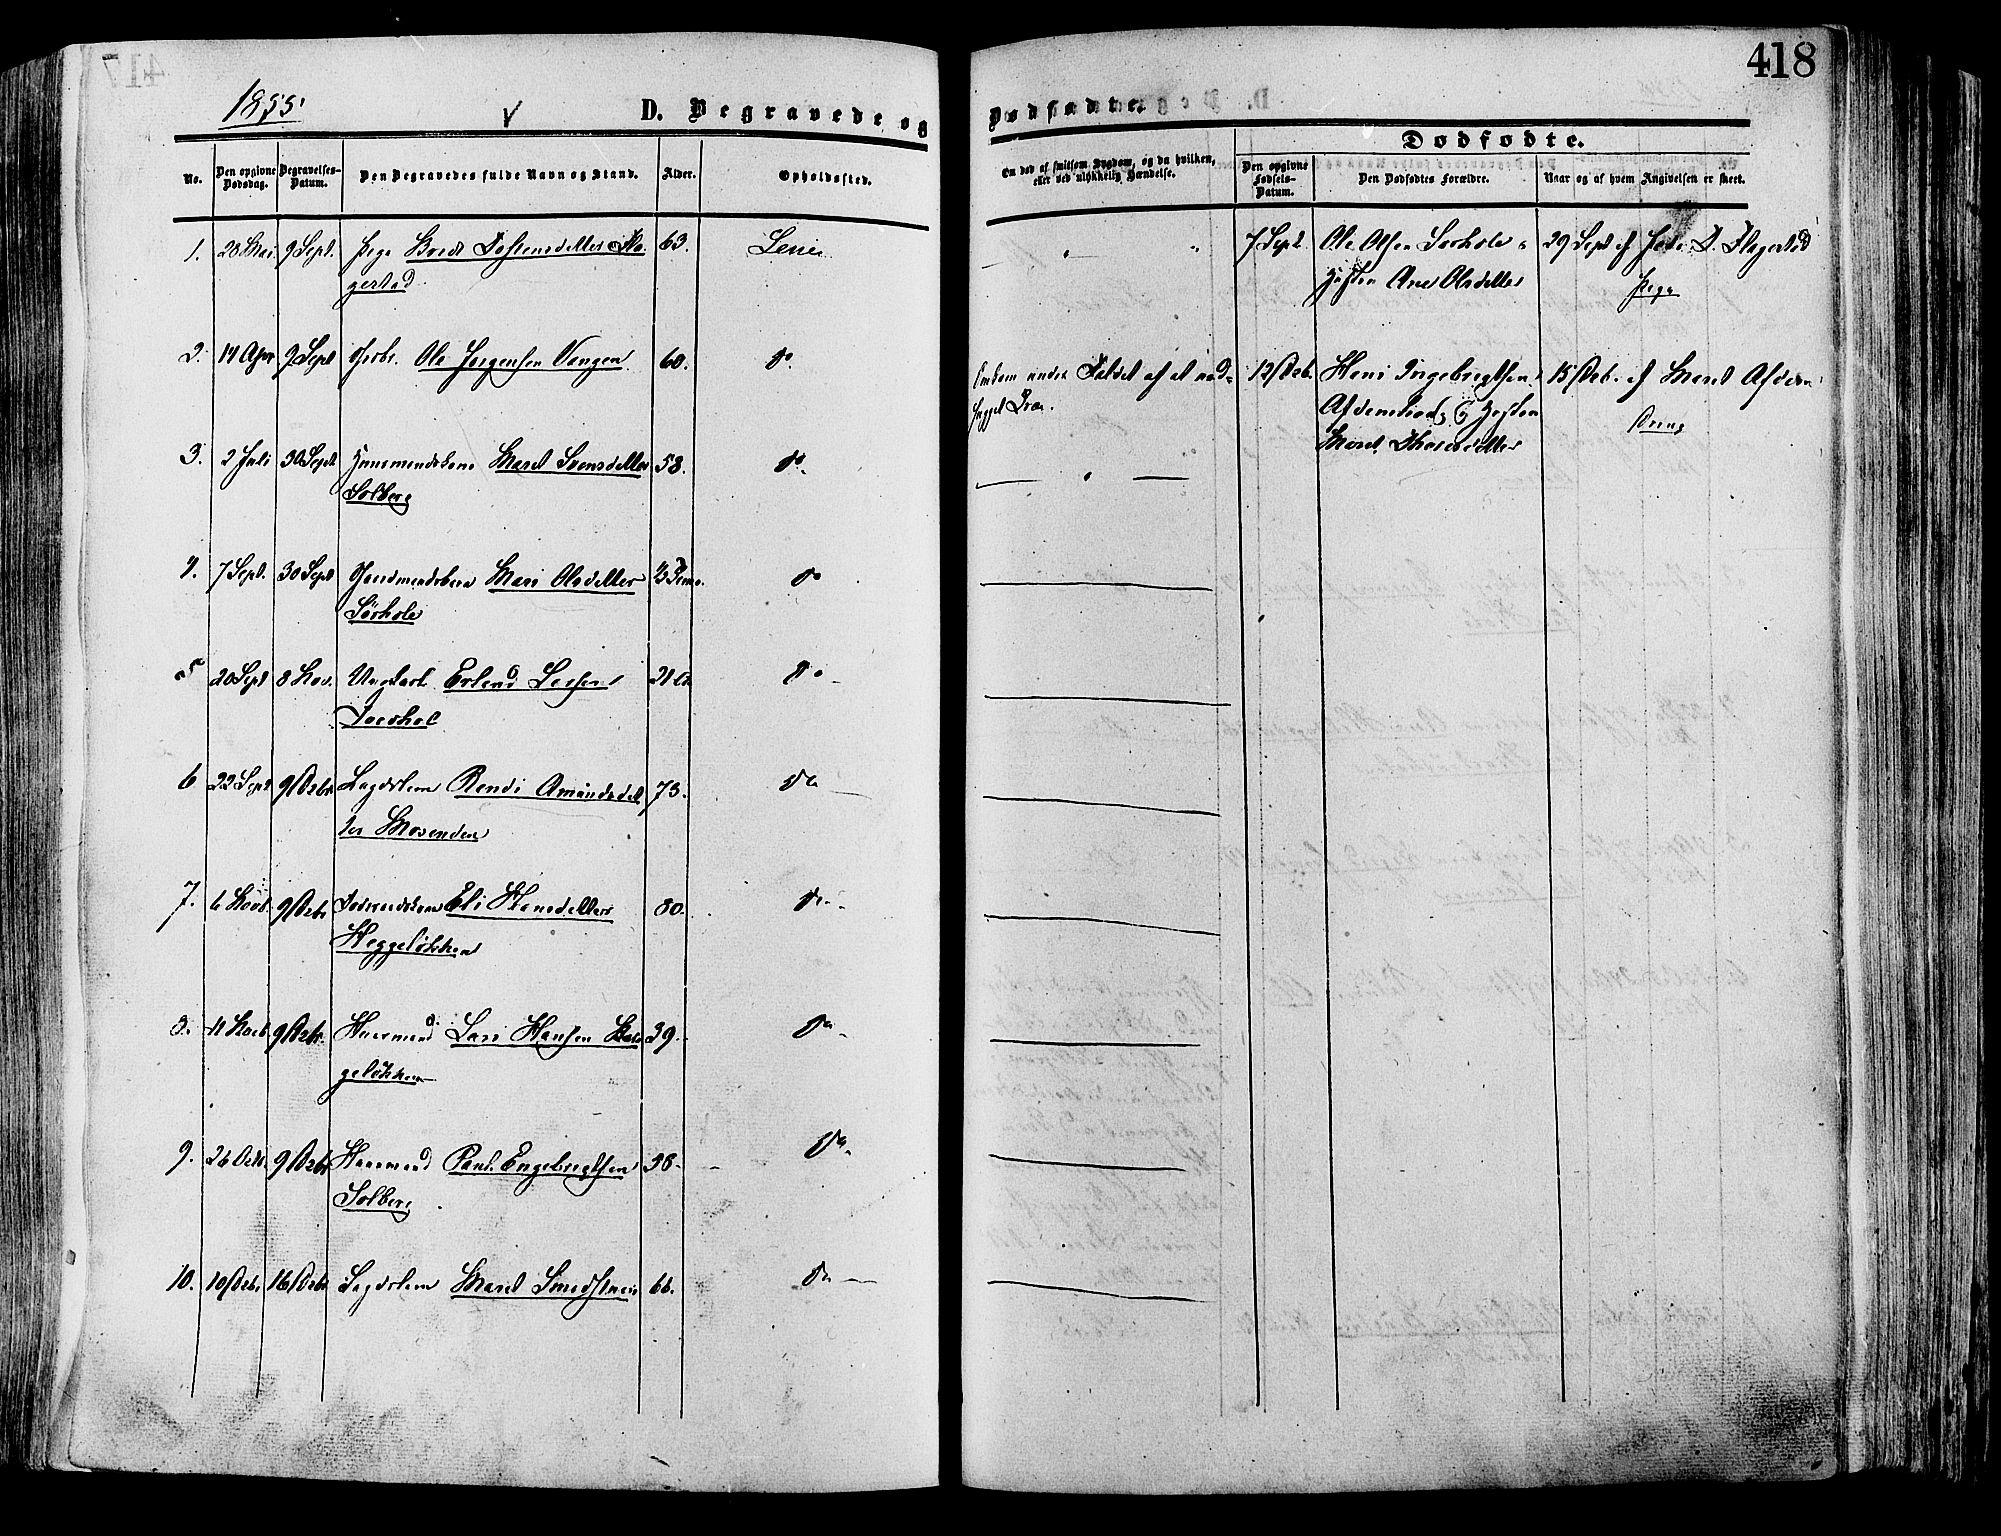 SAH, Lesja prestekontor, Ministerialbok nr. 8, 1854-1880, s. 418